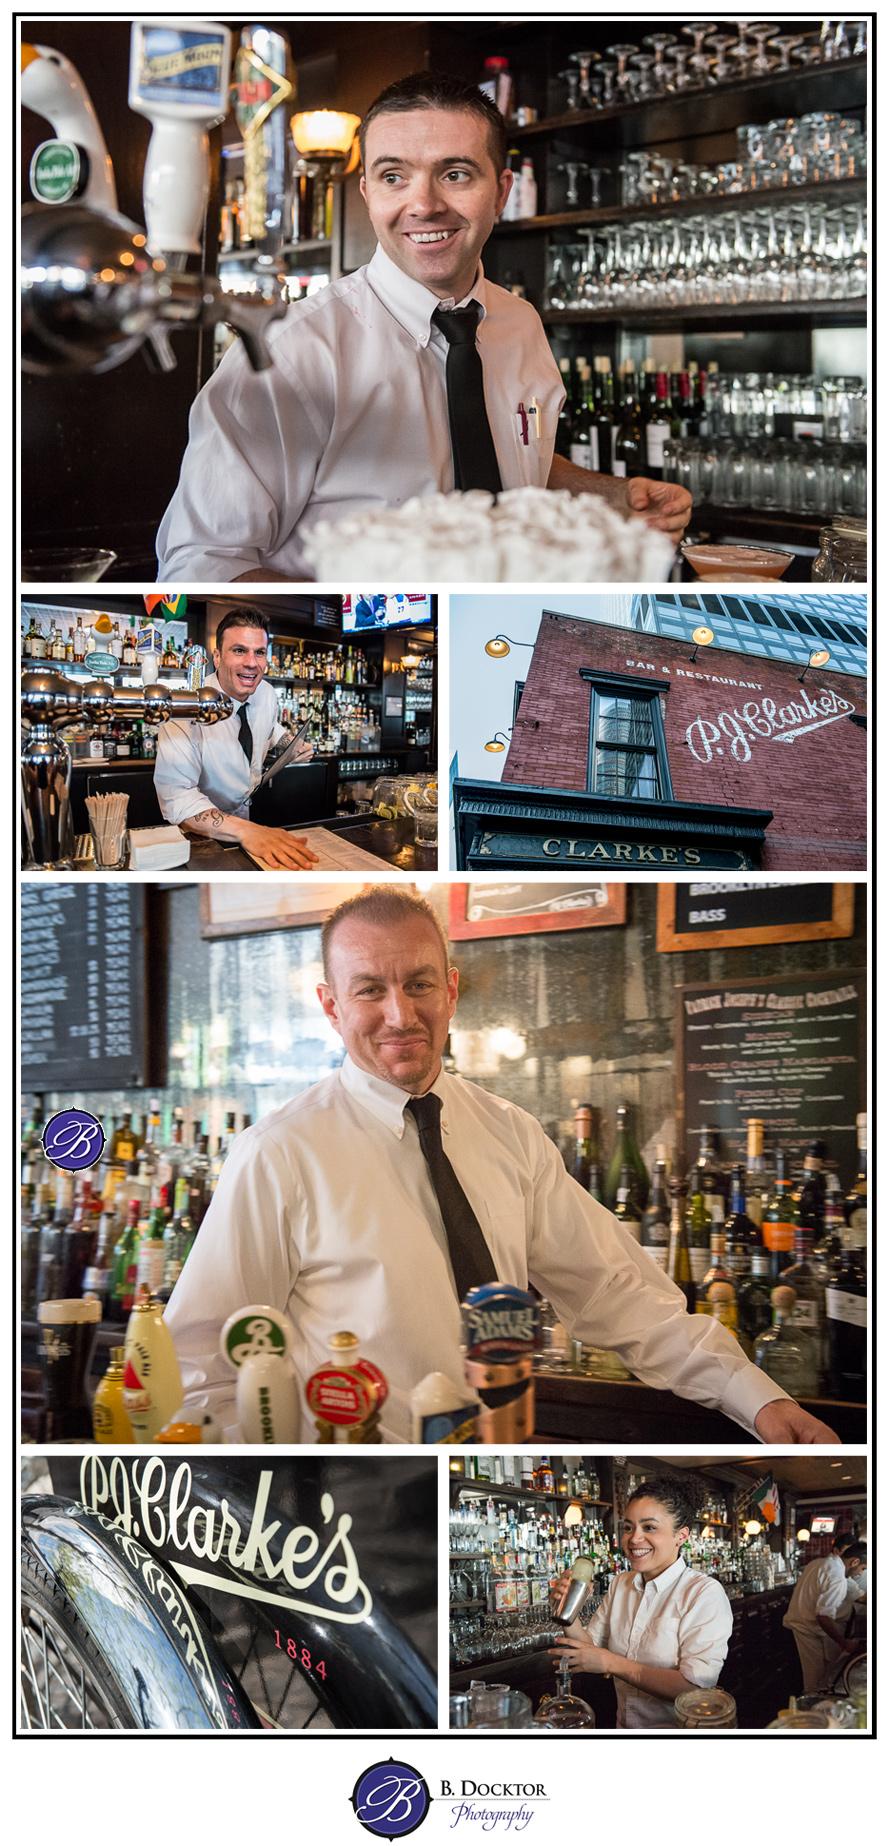 PJ Clarkes bartenders